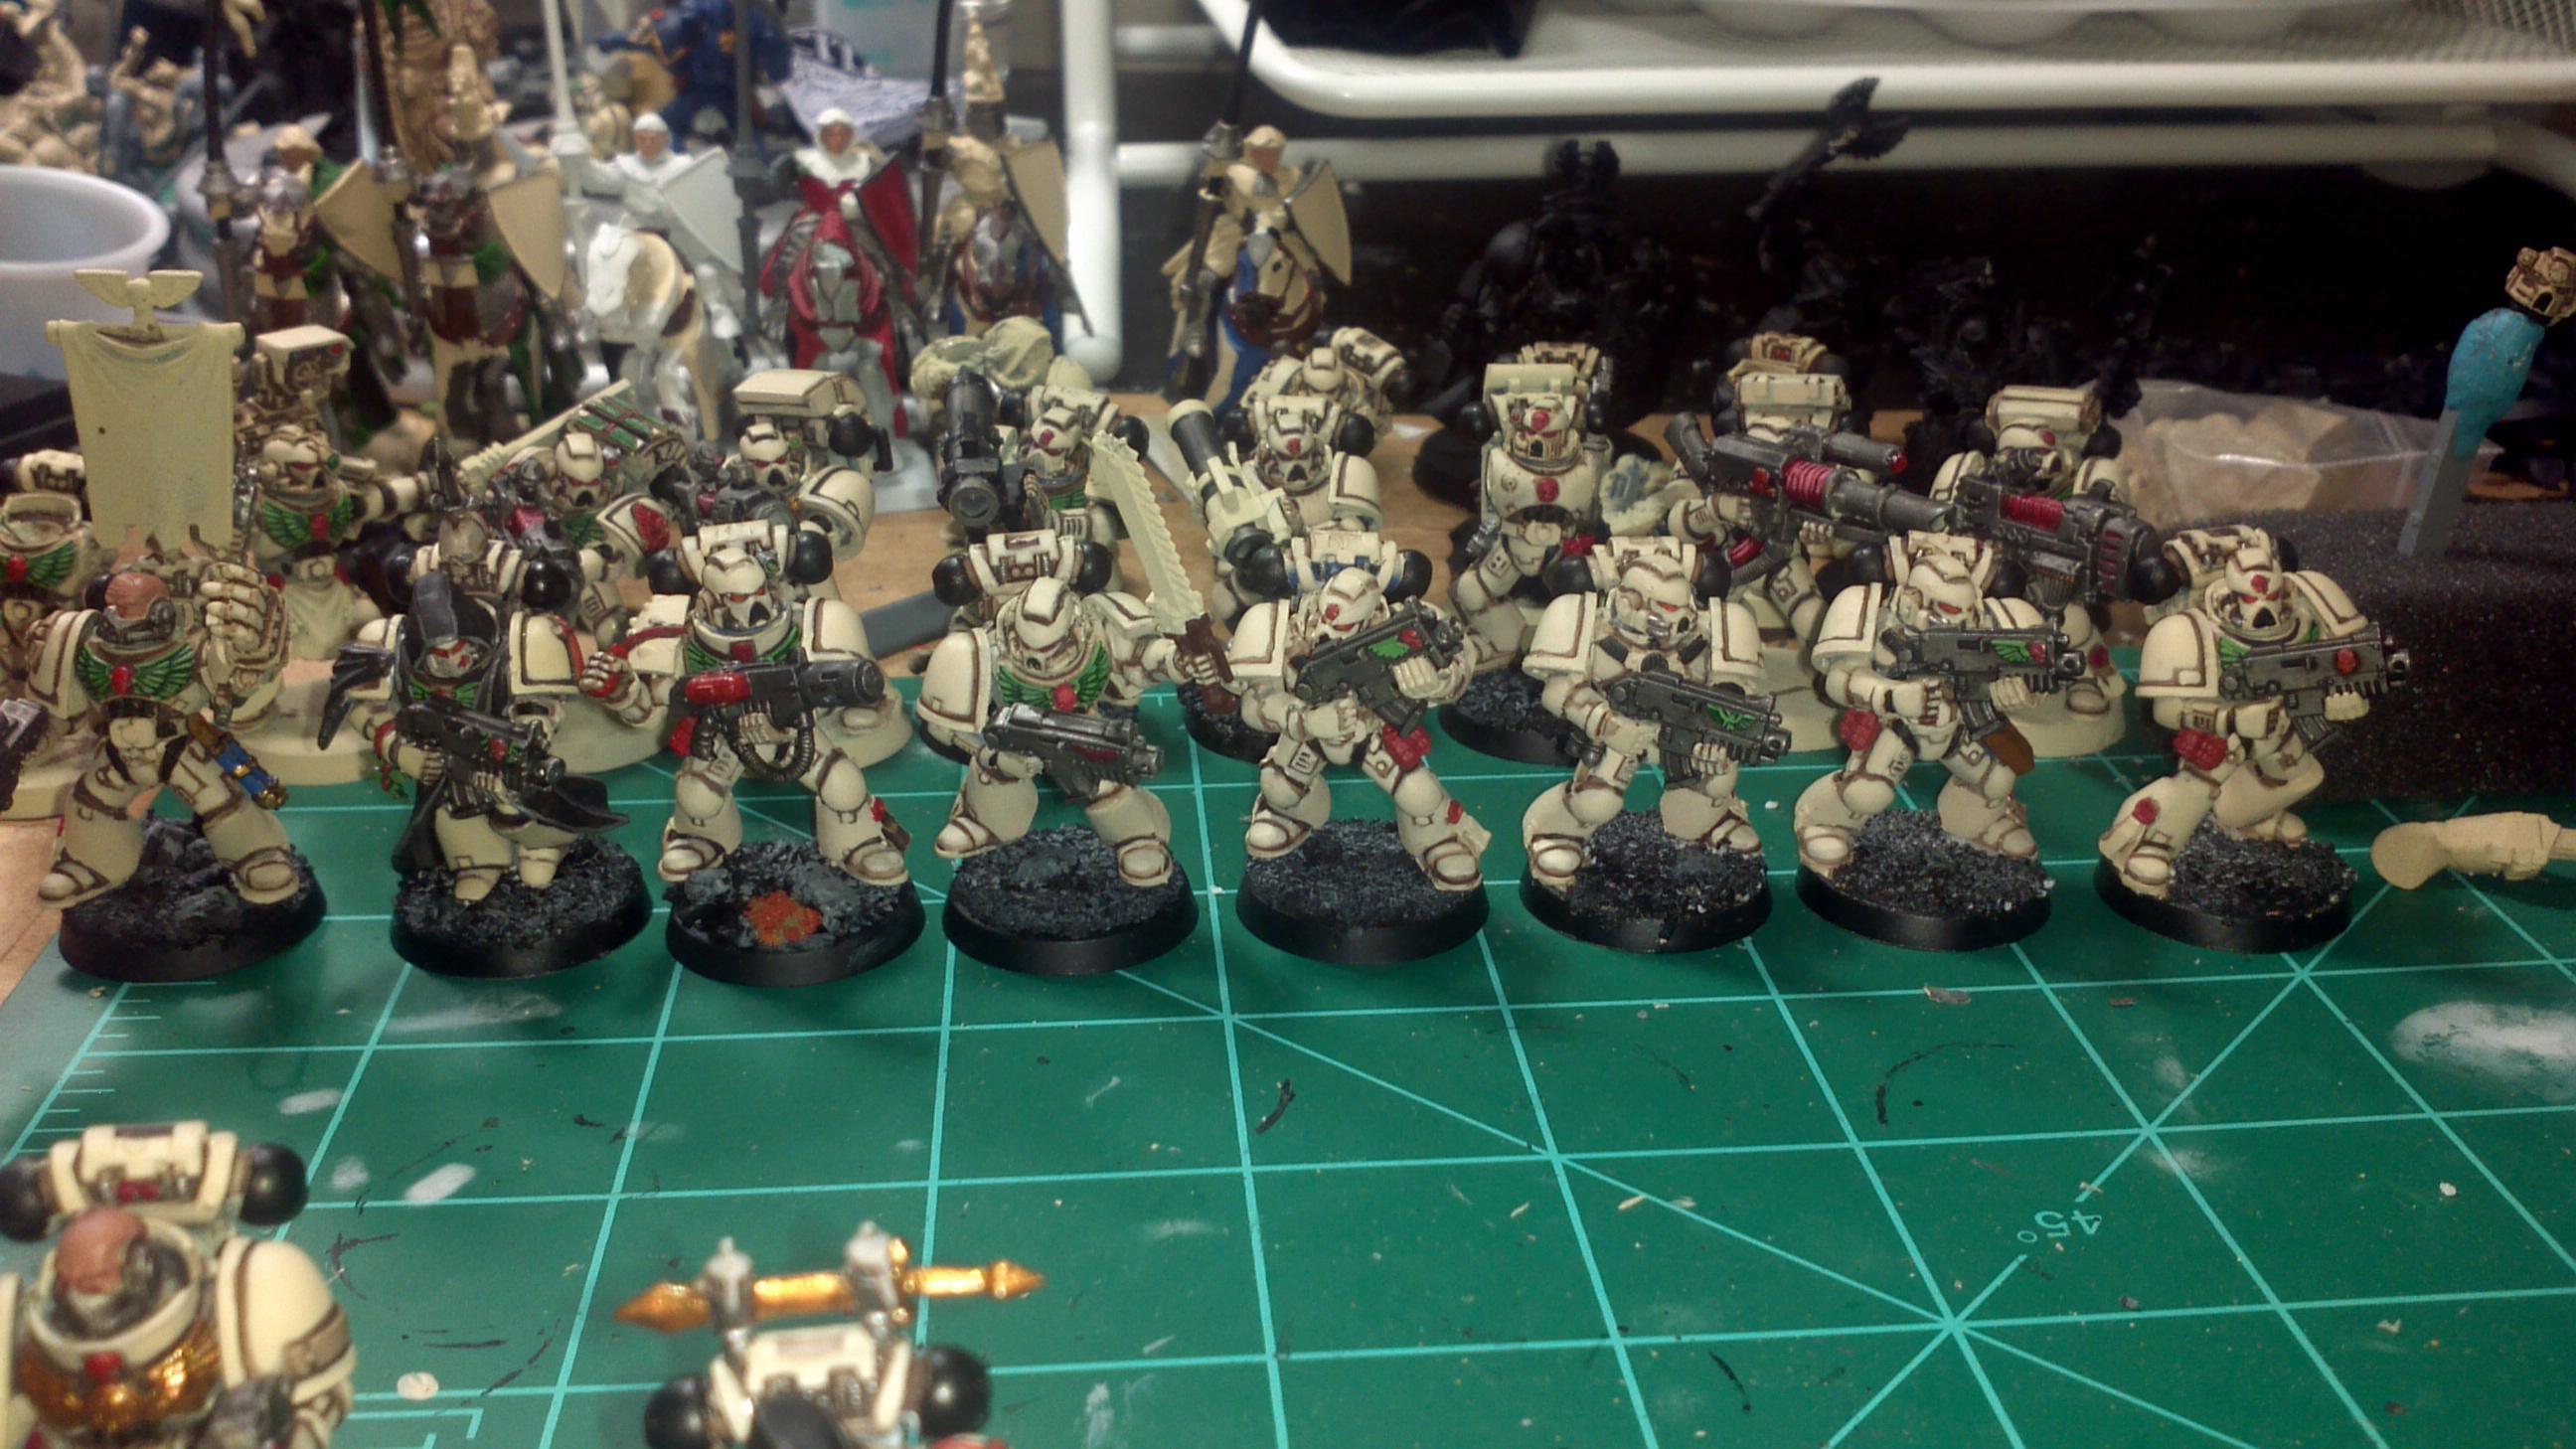 First squad - 8-man